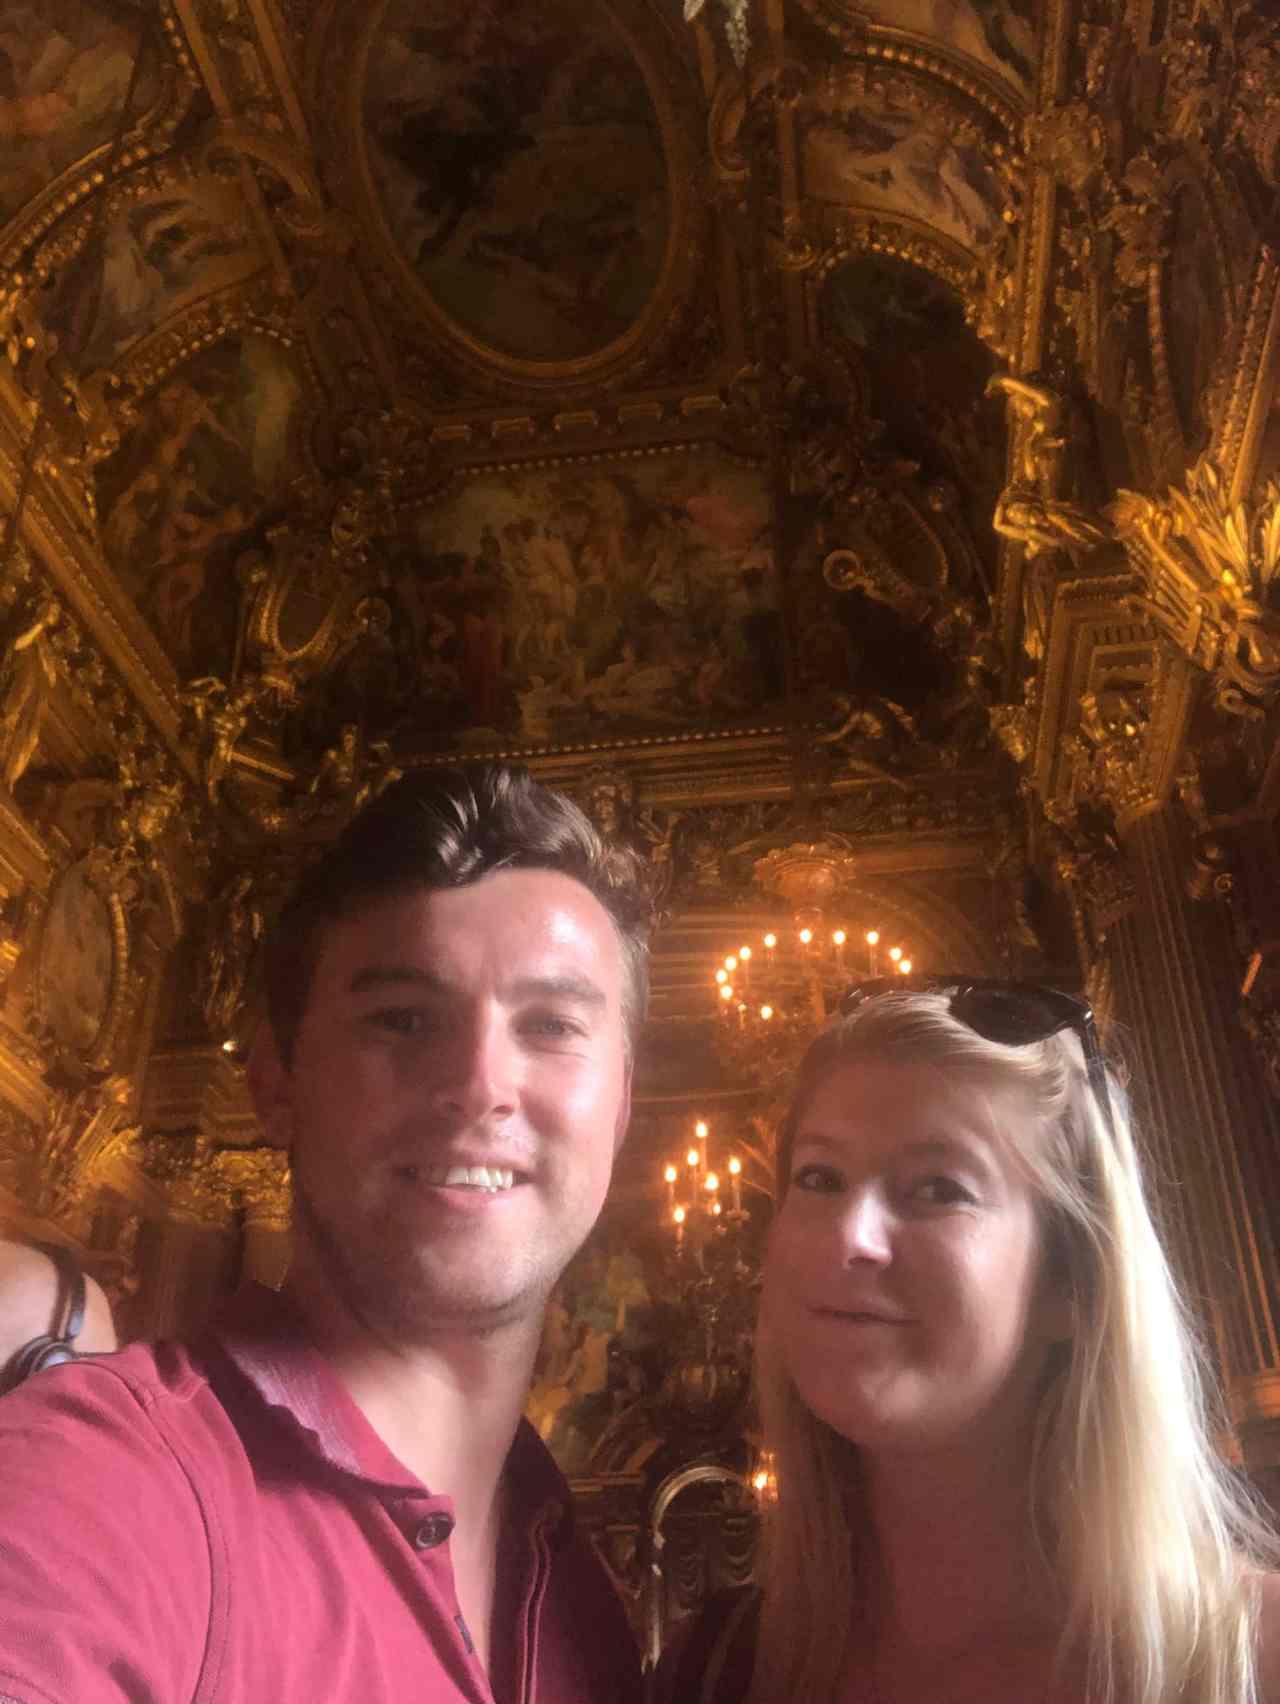 Palais Garnier Opera House Paris Ballroom selfie